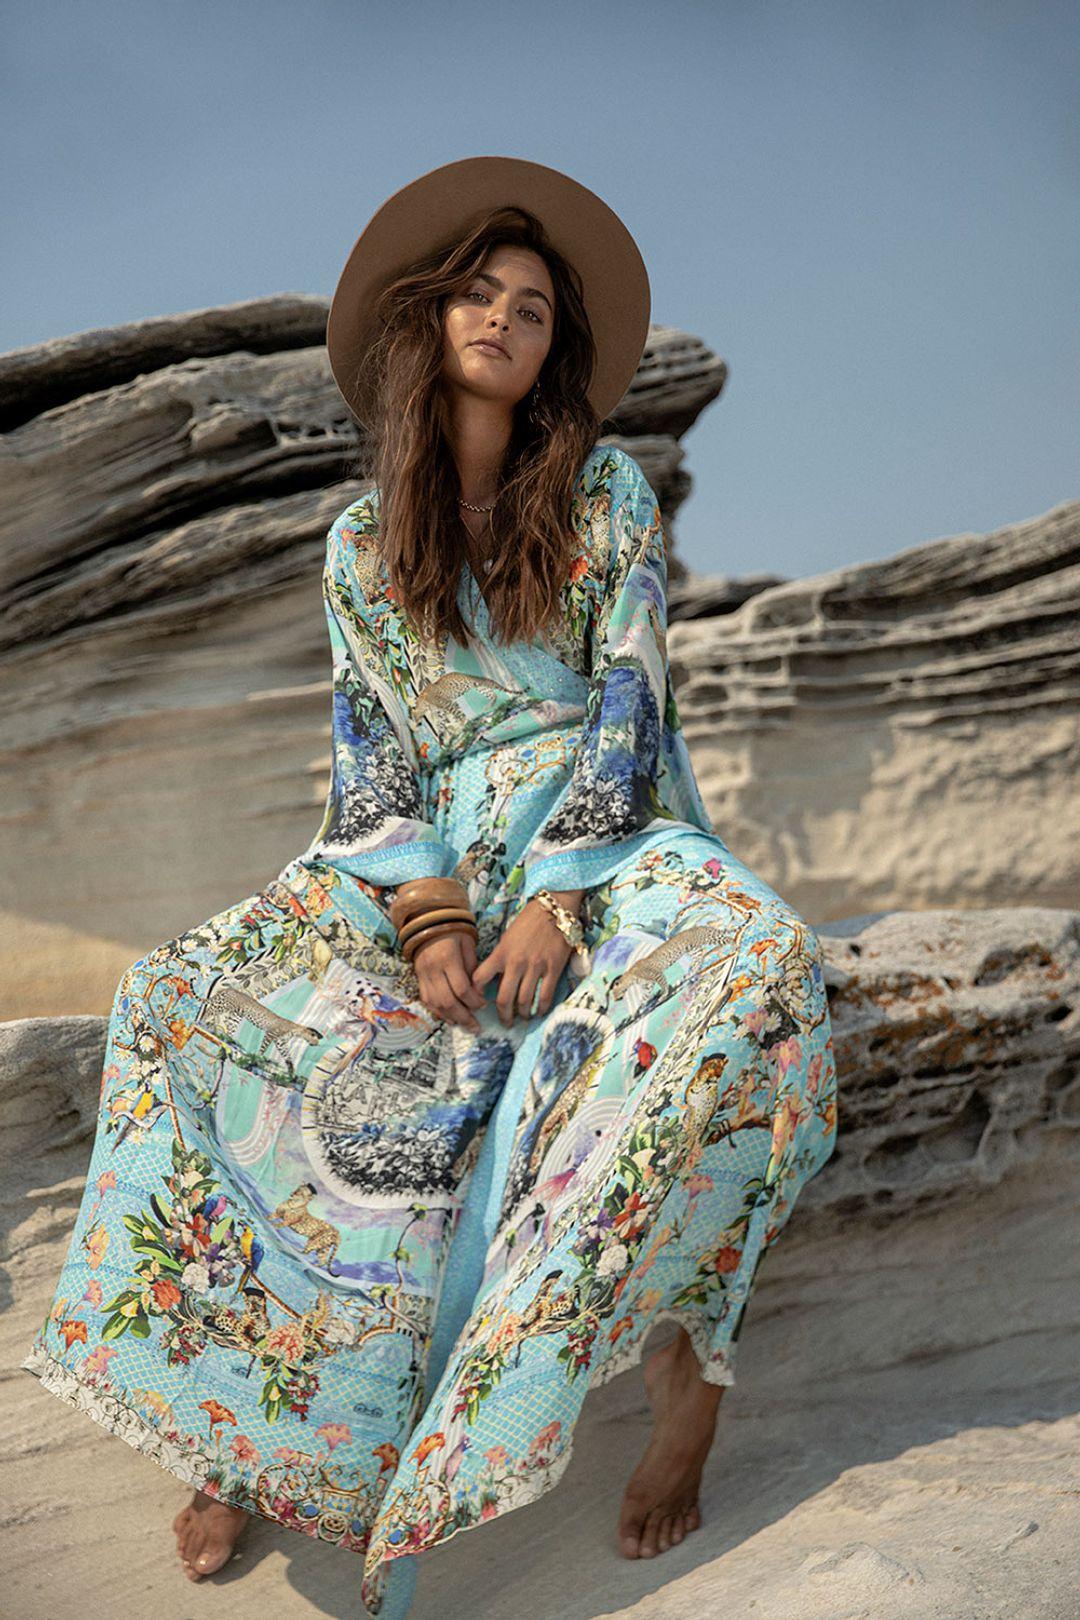 Camilla-Kimono-Wrap-Dress-Girl-from-St-Tropez-campaign